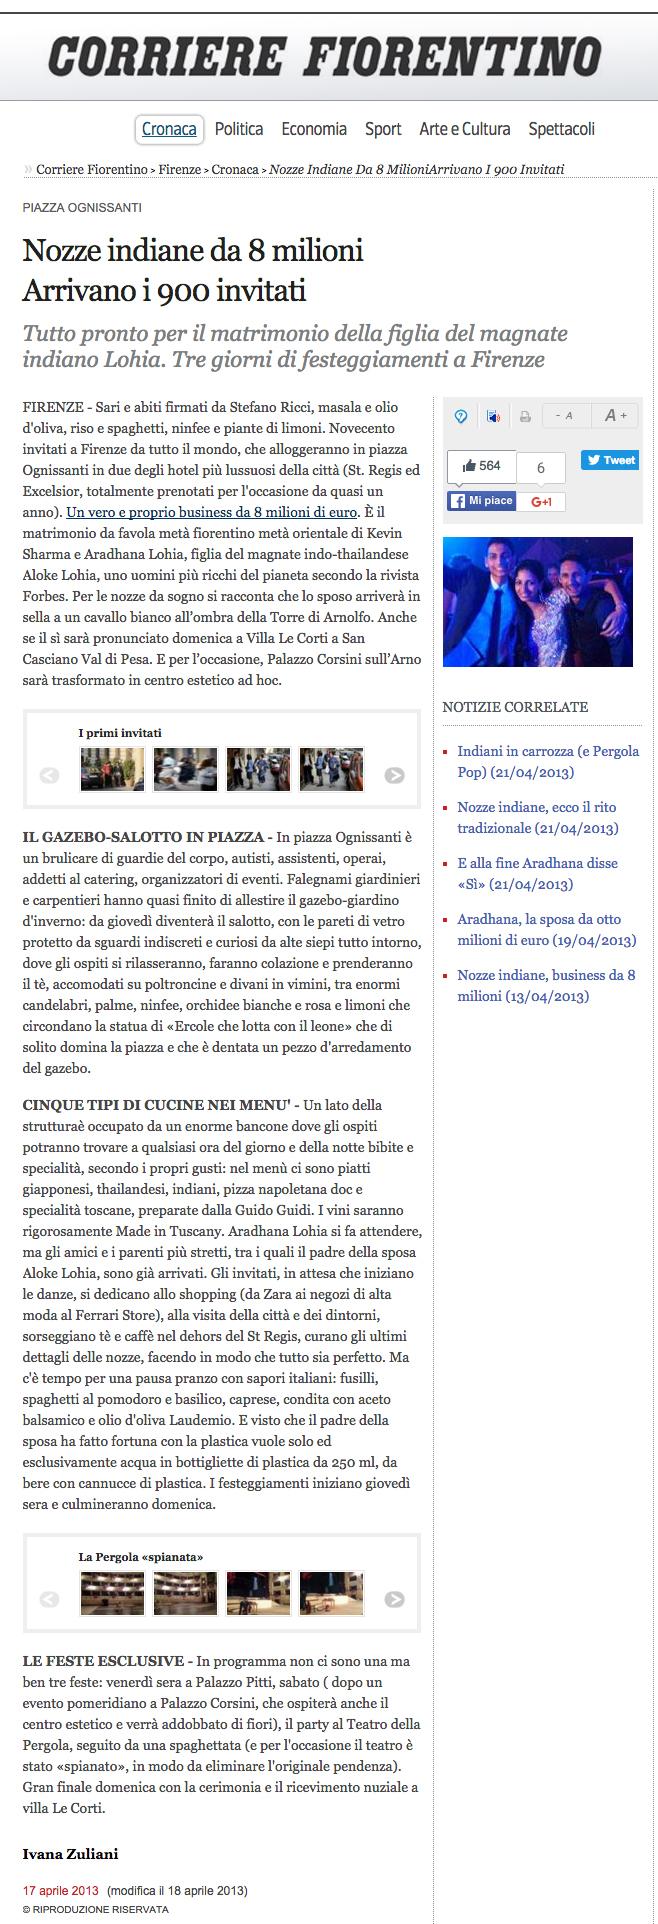 corriere-fiorentino-matteo-corvino-wedding-planner-01